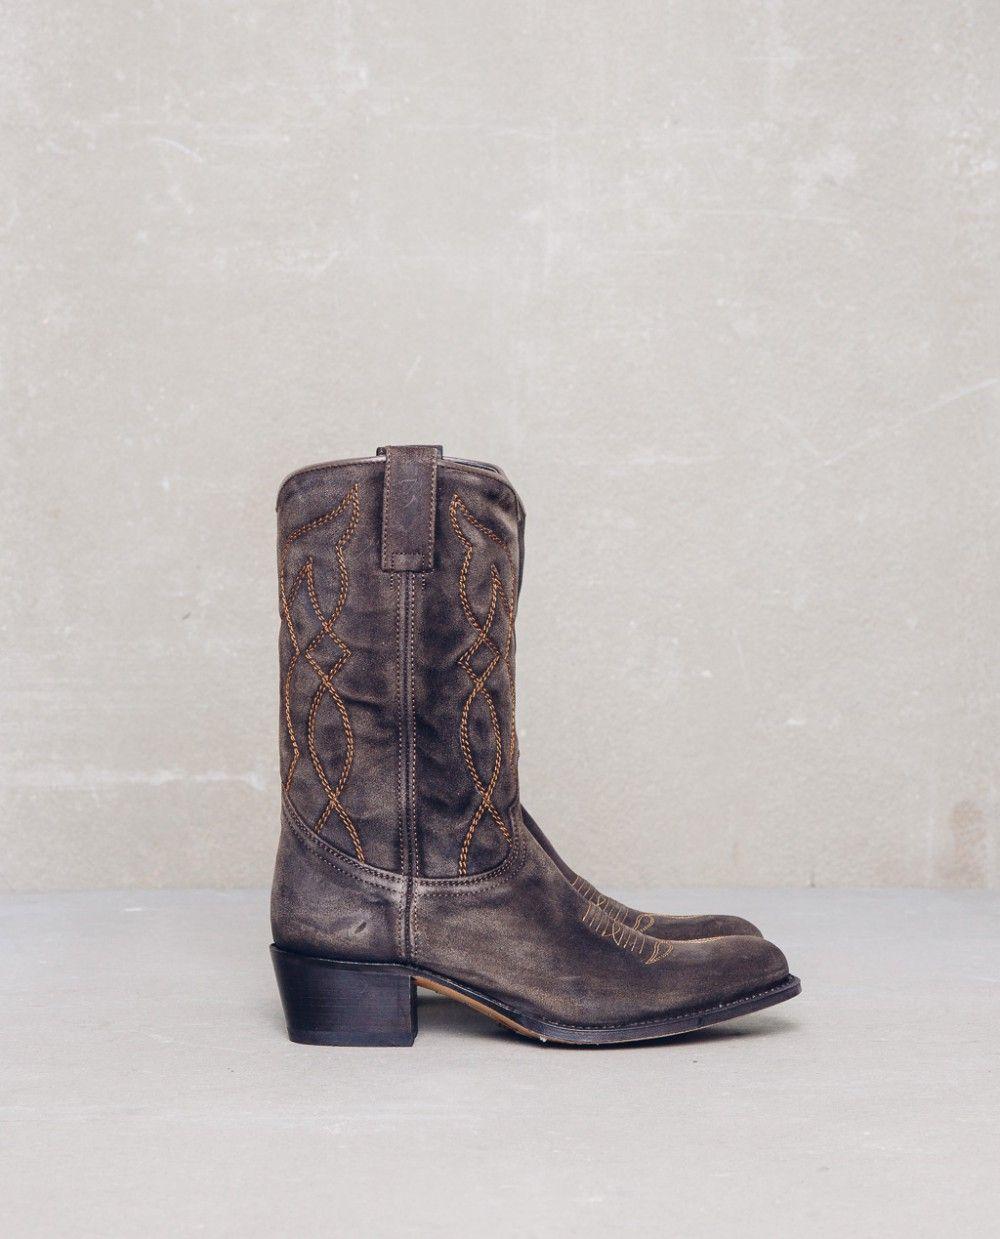 0ac13a30164 Botas wild | Complementos | Shoes, Boots, Fashion